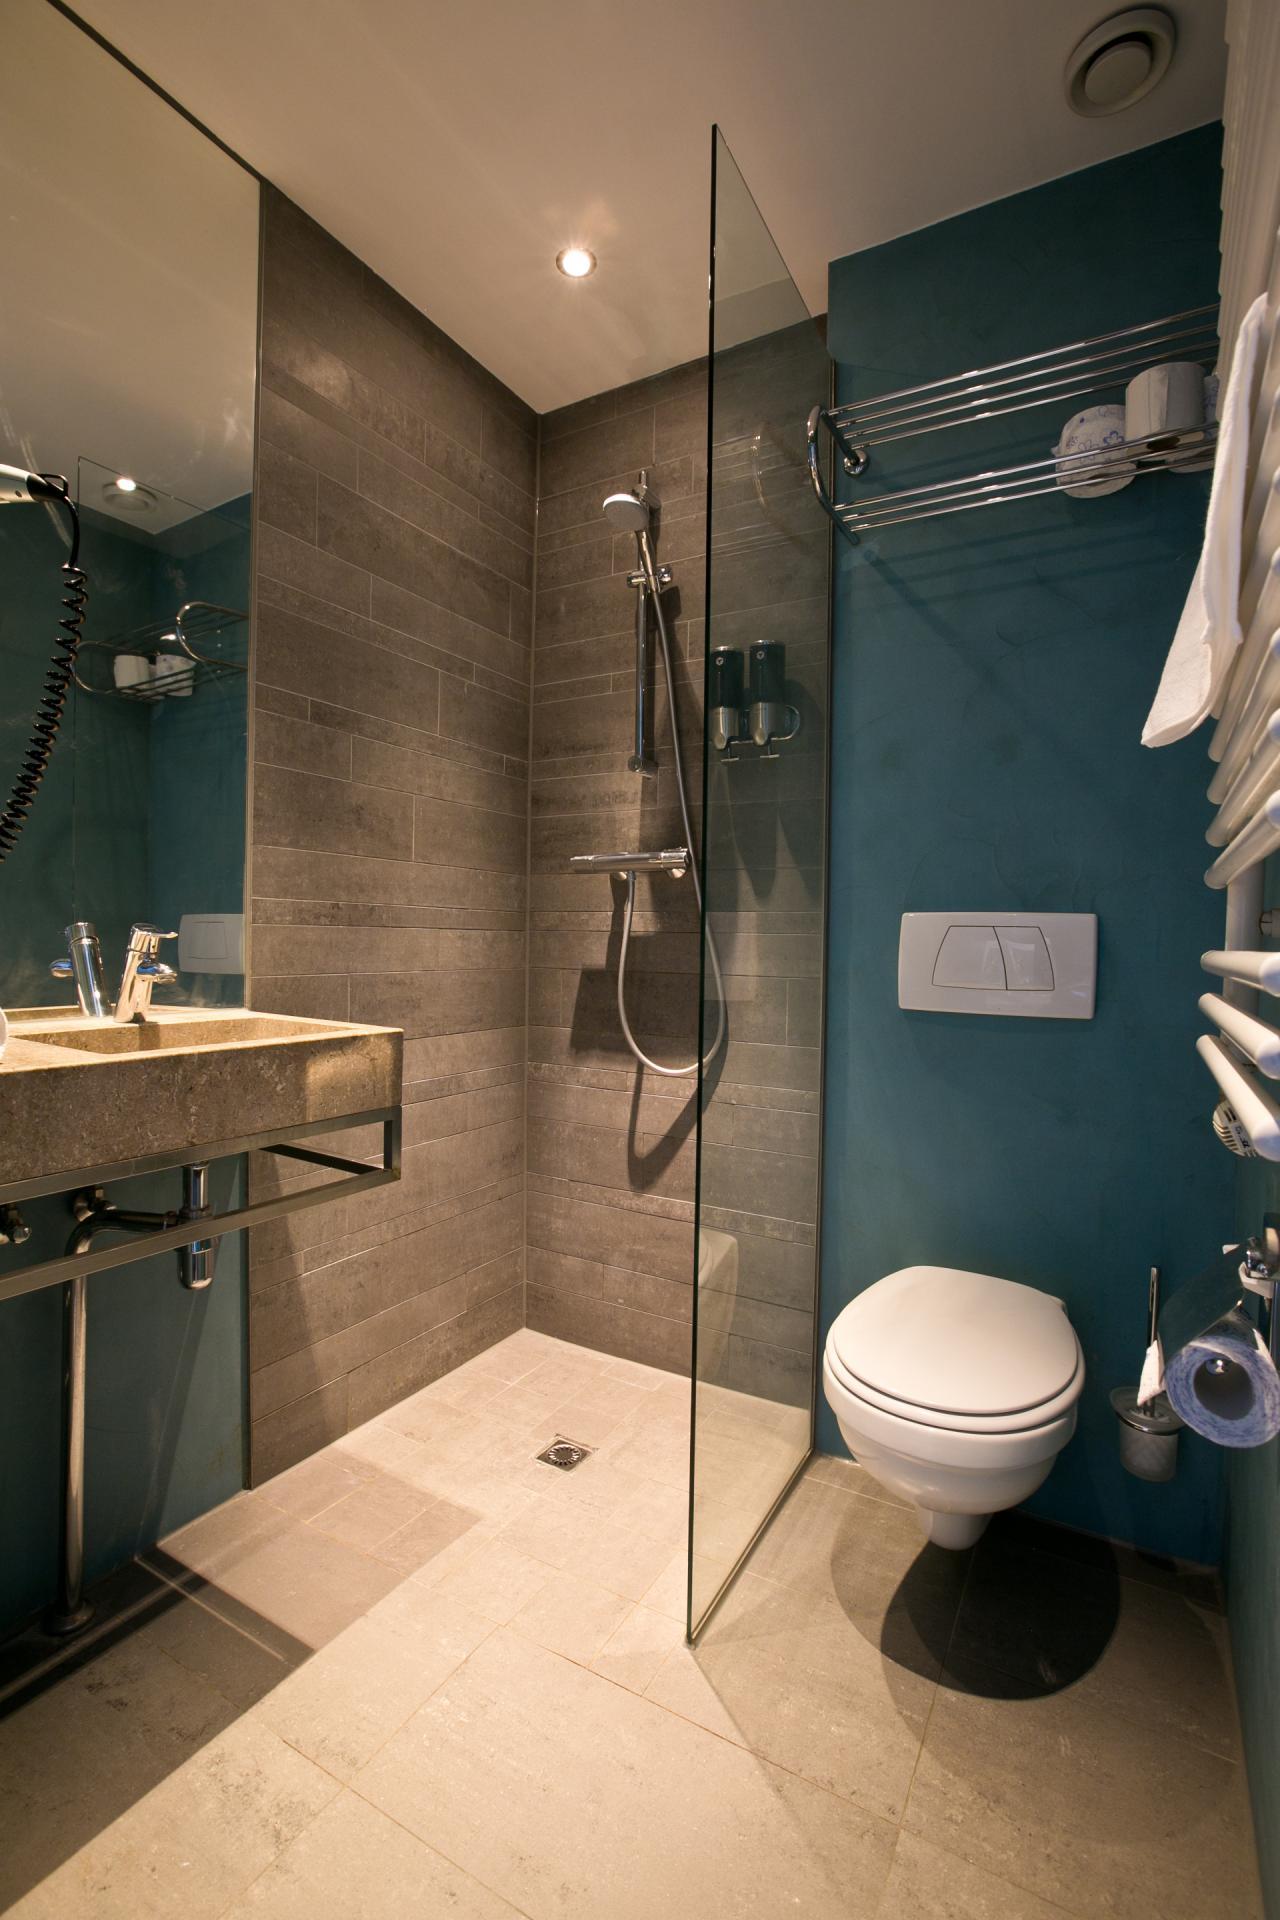 Bathroom at Cityden Museum Square Apartments, Amsterdam